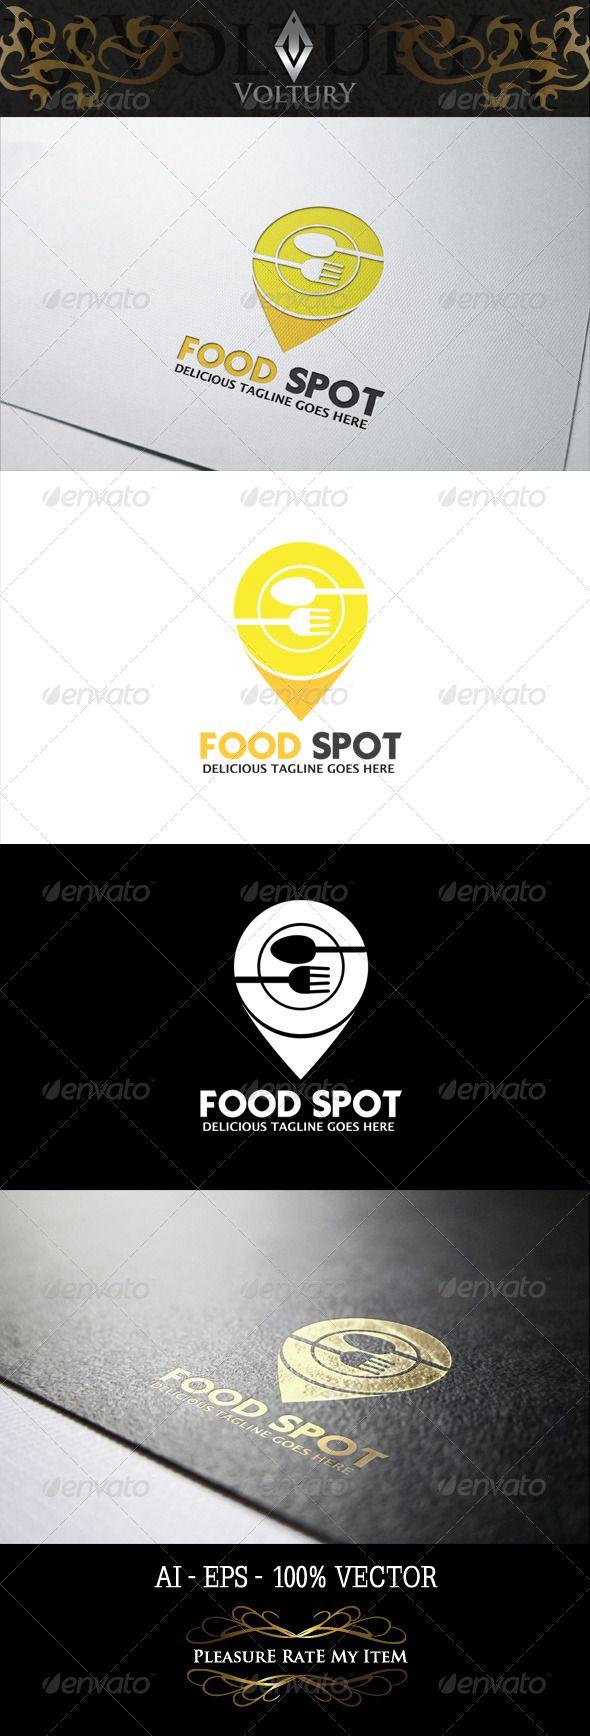 Food Spot Logo